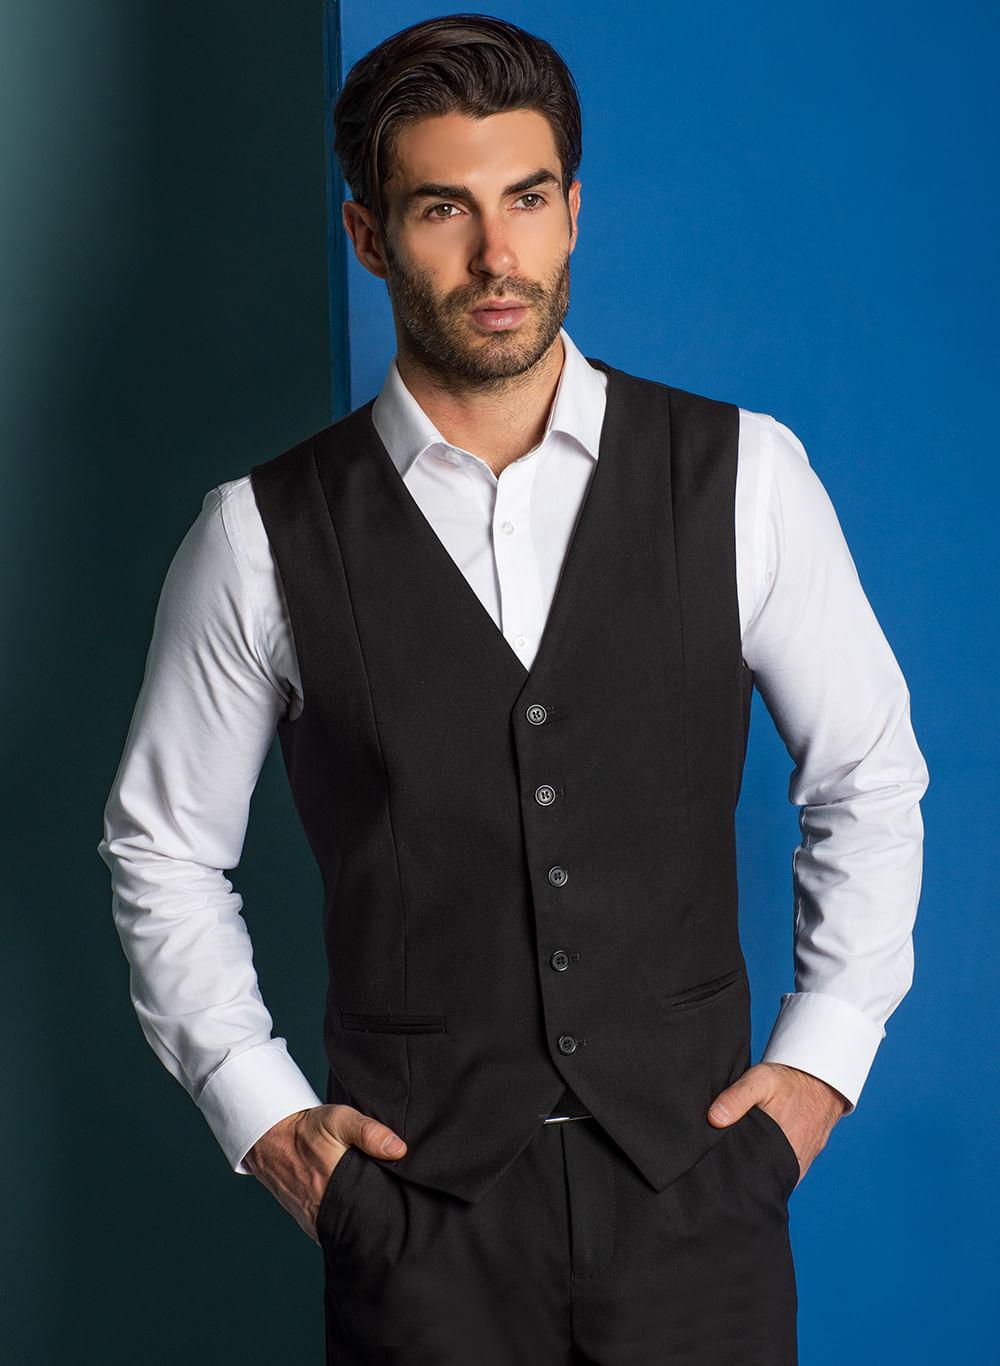 Chaleco Vestir Color Negro Marca Aldo Conti Black